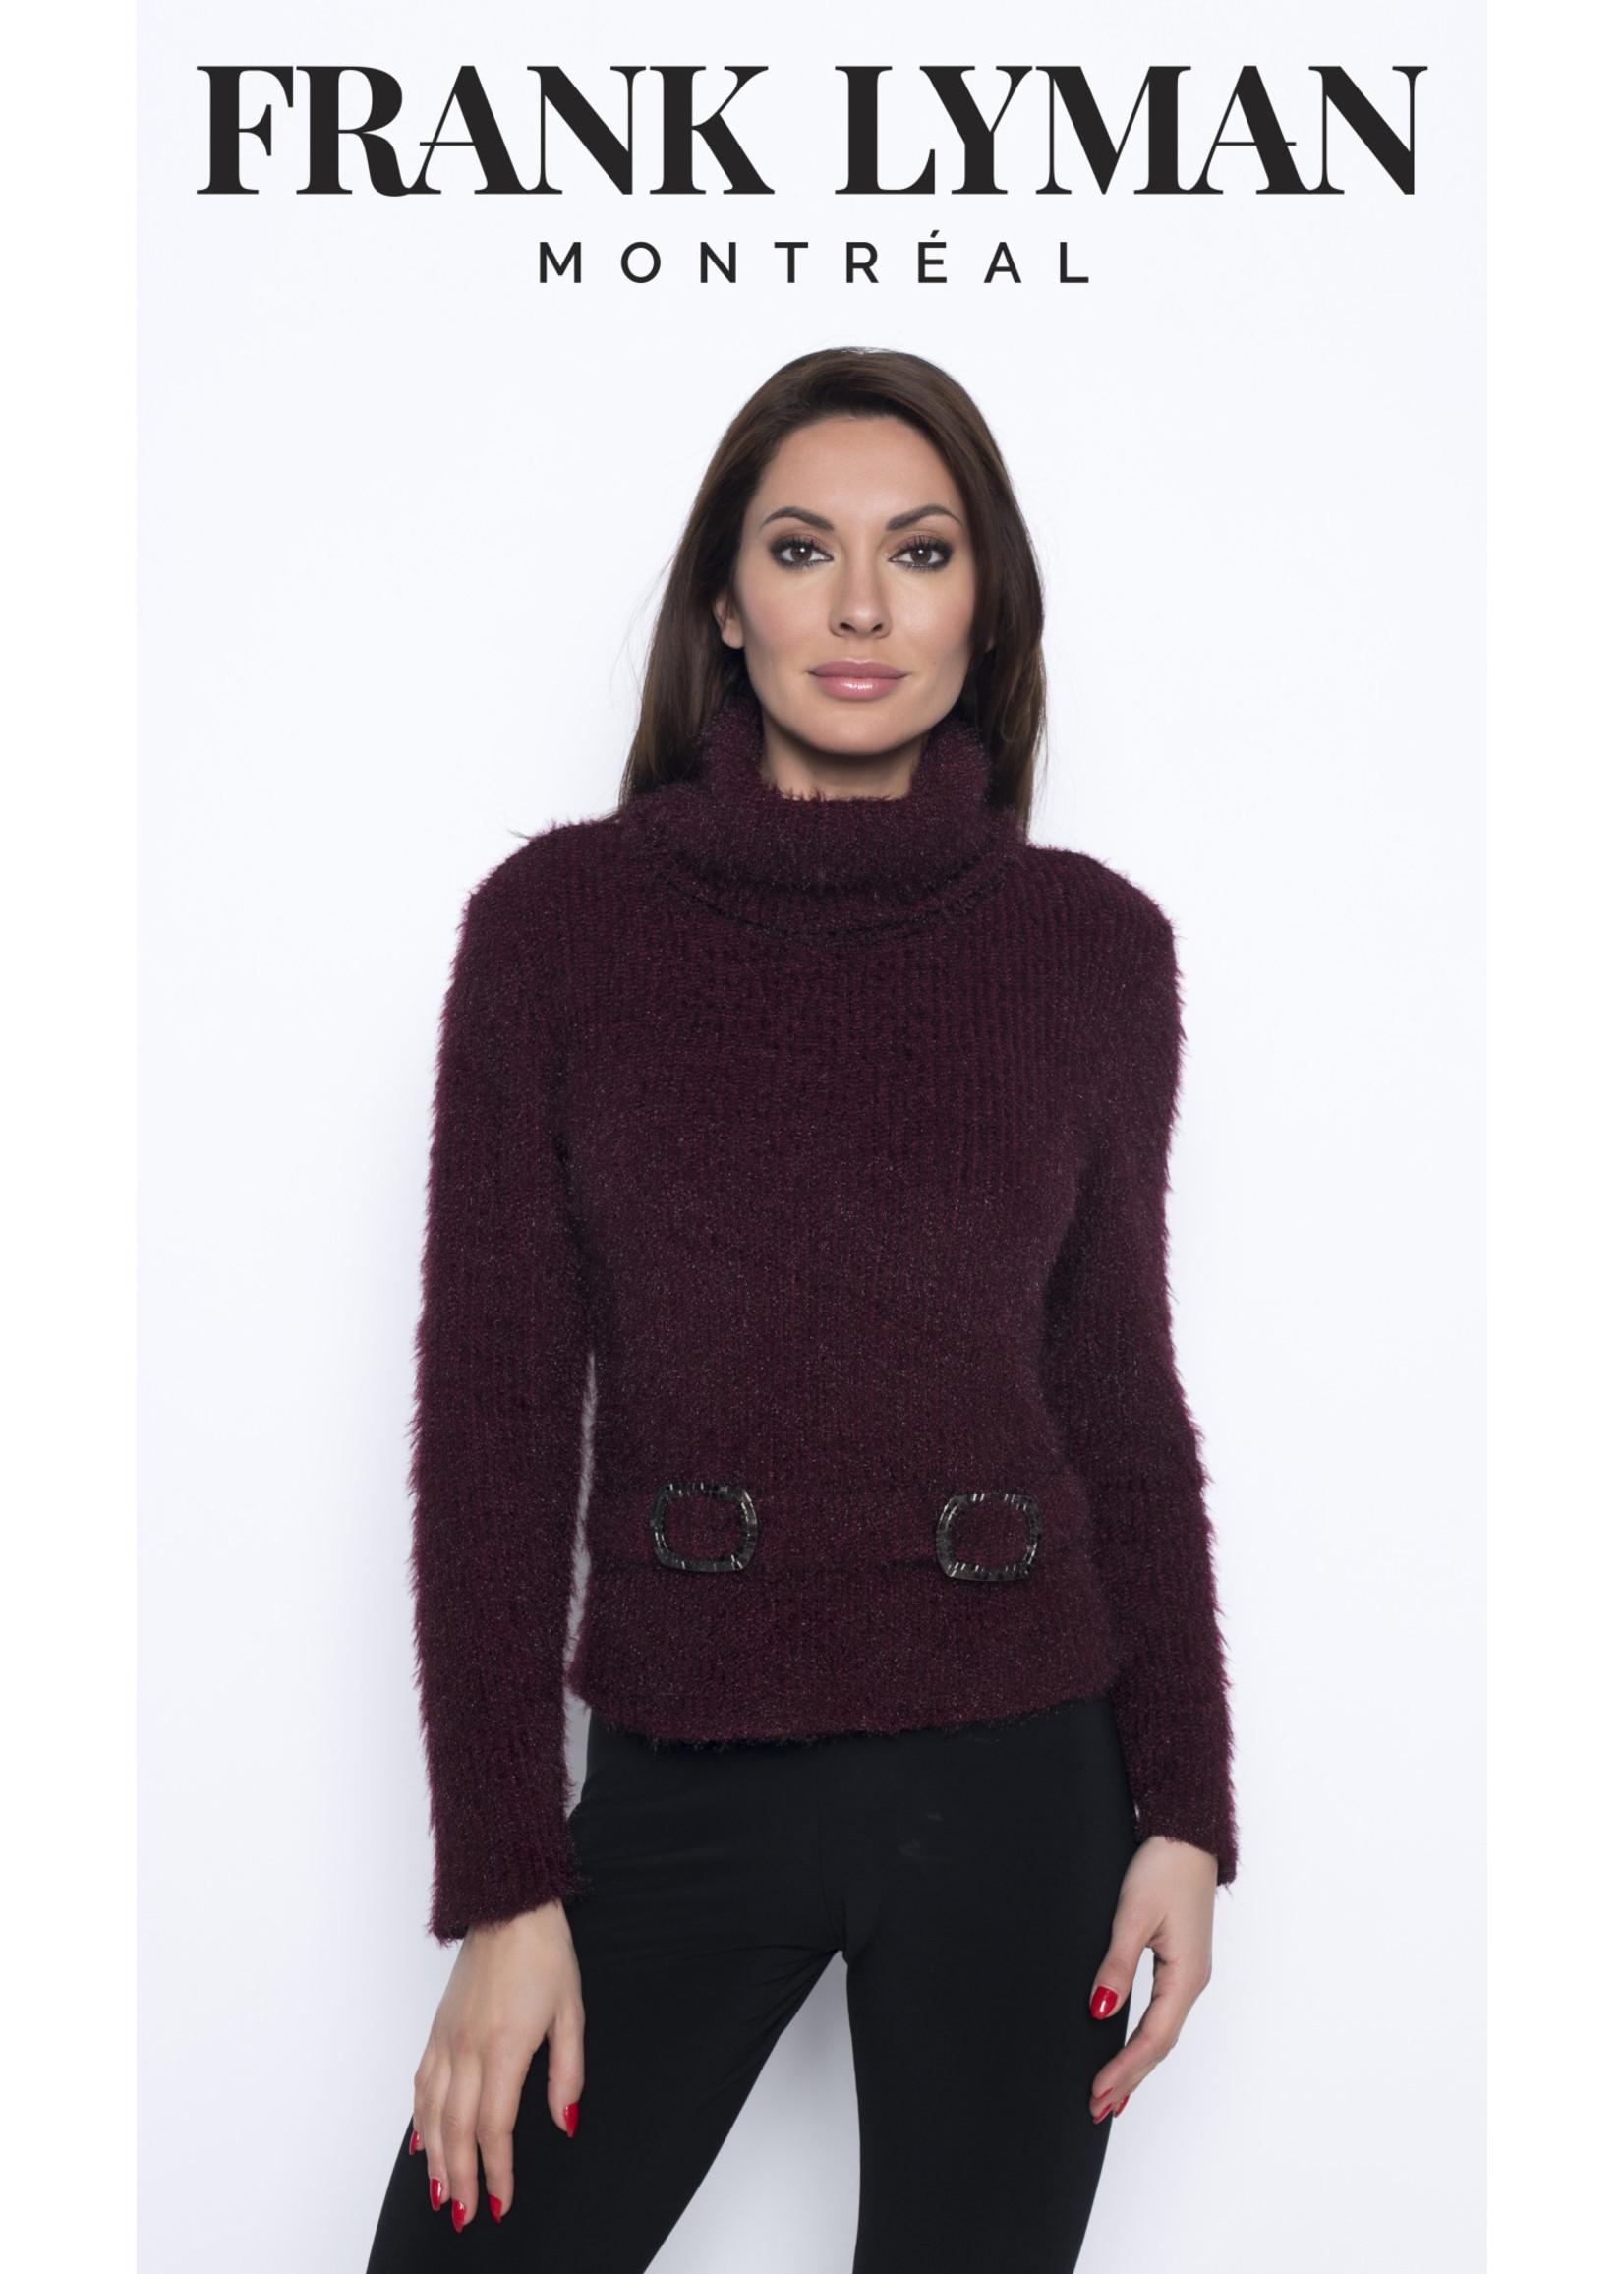 Frank Lyman Bordeaux Sweater